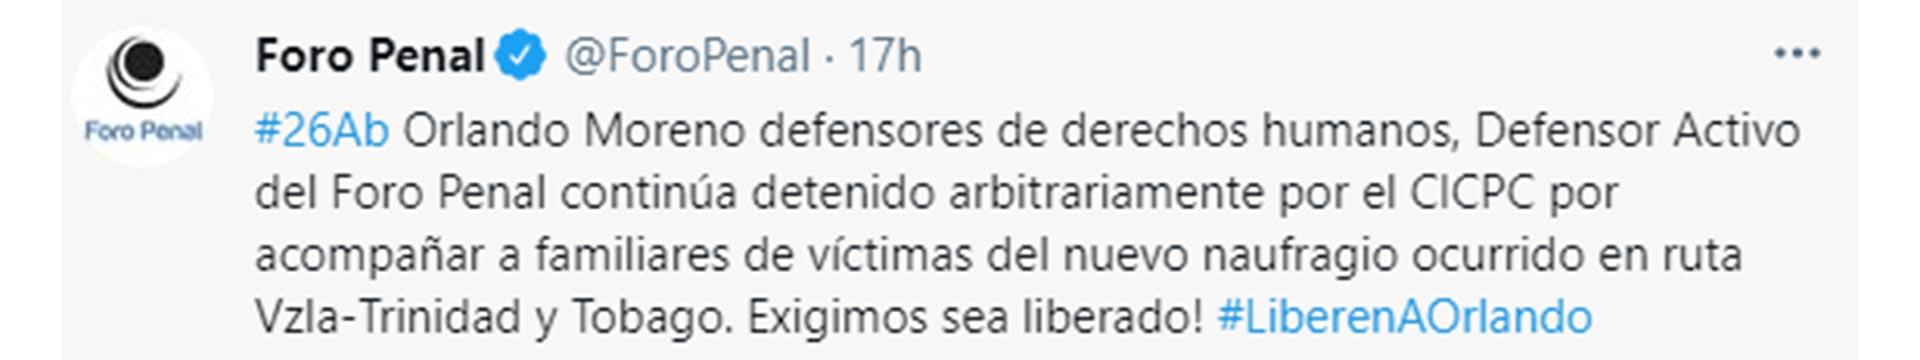 El tuit del Foro Penal